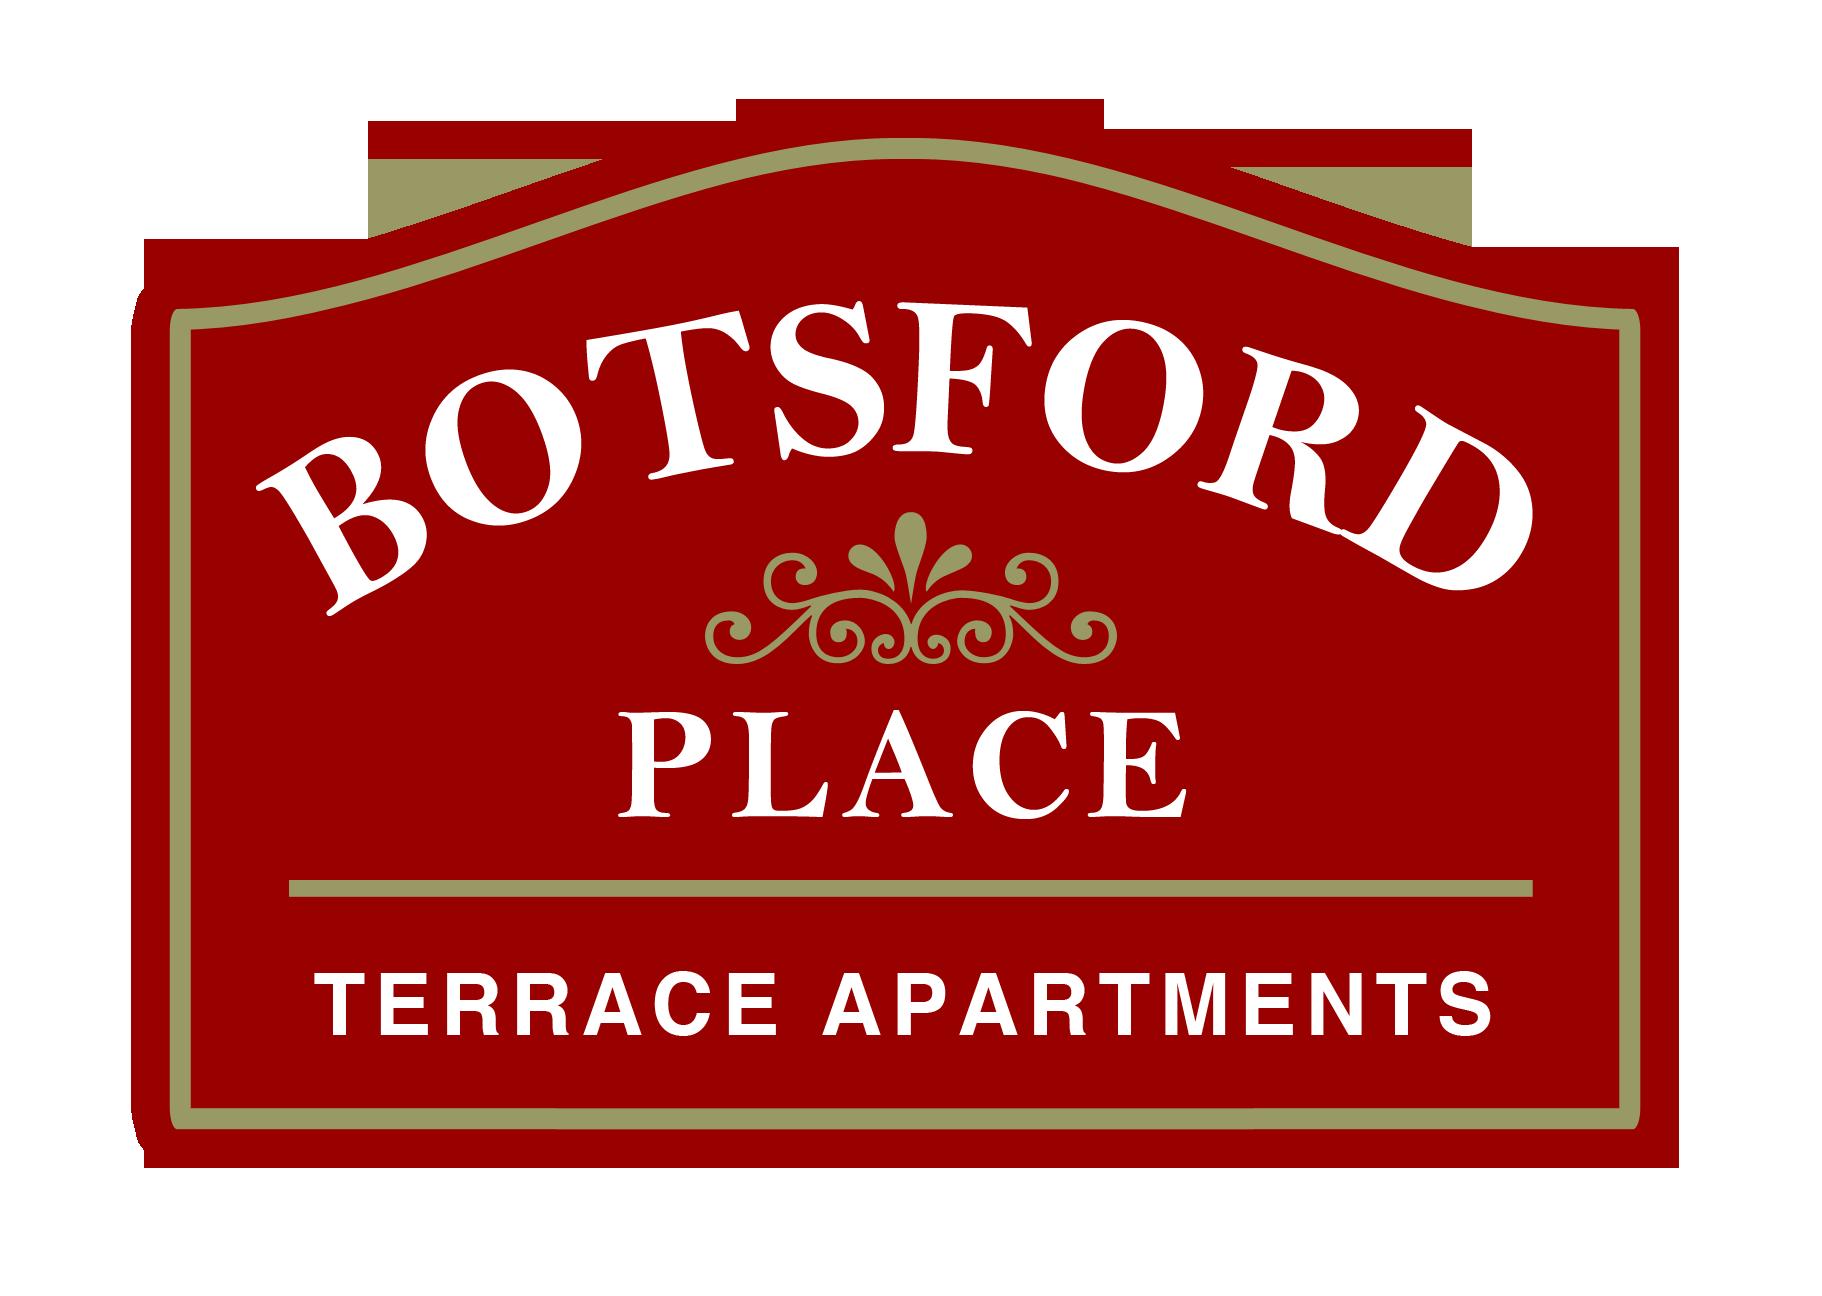 Botsford Place Terrace Apartments